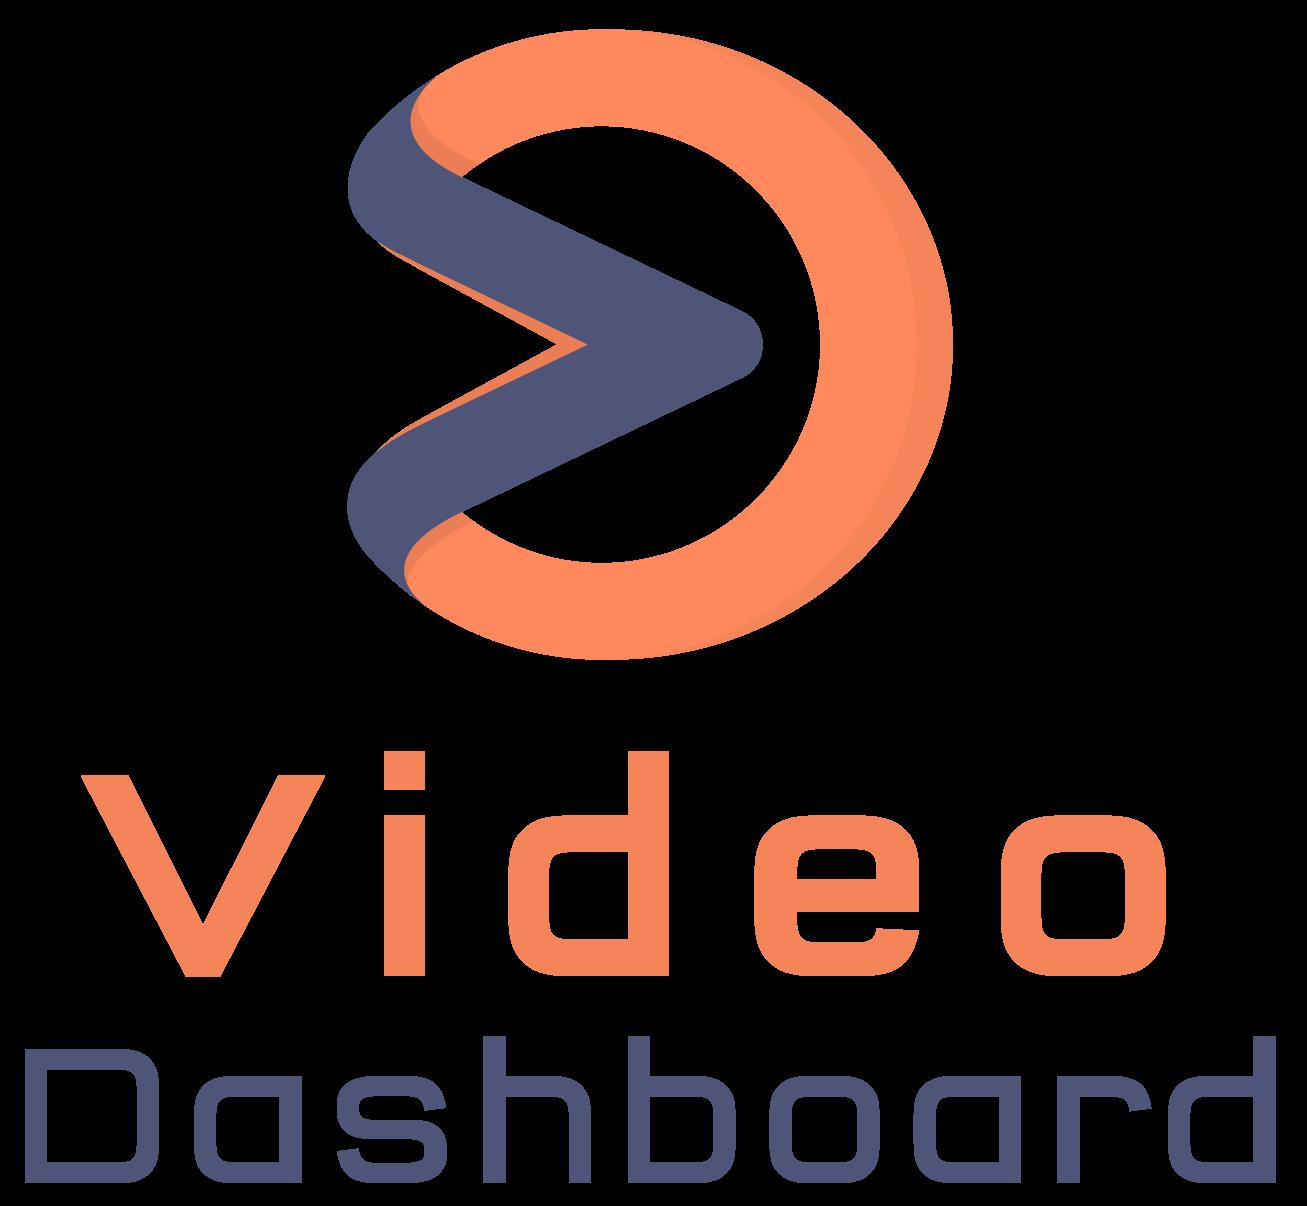 Video Dashboard app